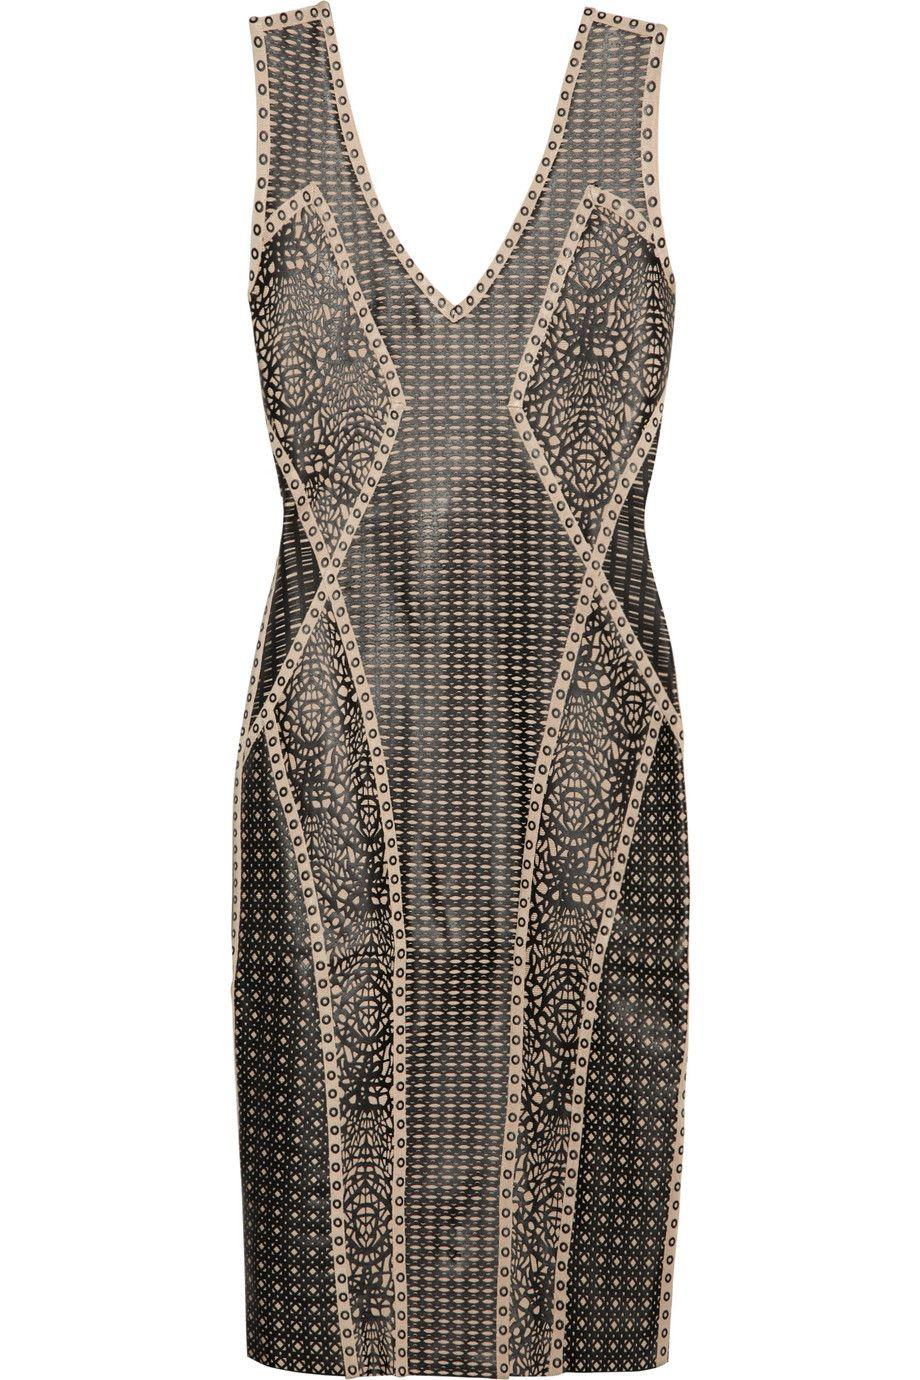 5f58255e6e610 Discount designer clothes for women sale. Hervé Léger